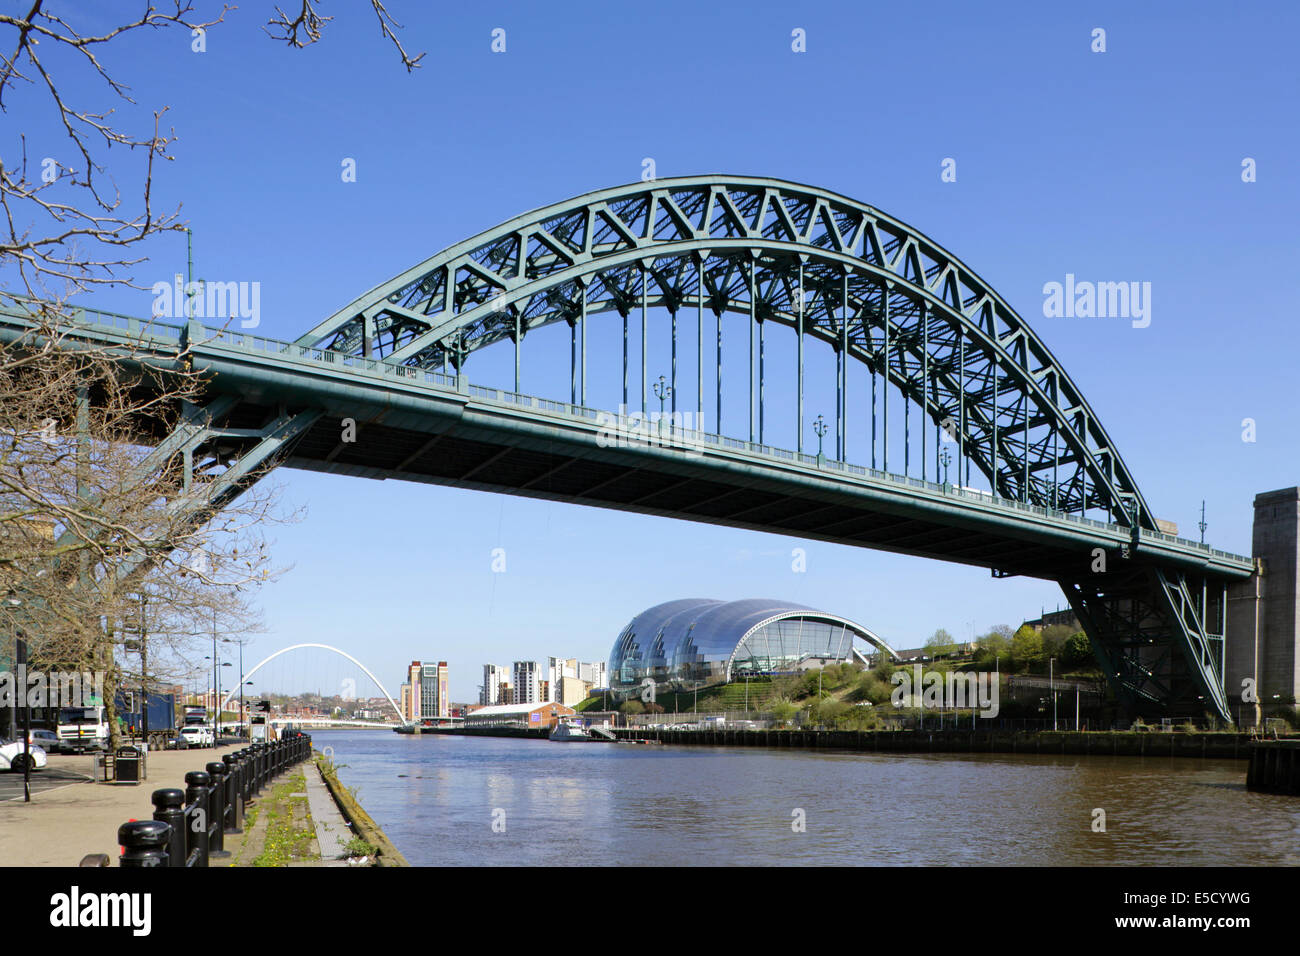 The Tyne bridge between Gateshead and Newcastle-upon-Tyne, UK, with the Millennium Bridge, Baltic Arts Centre and Stock Photo